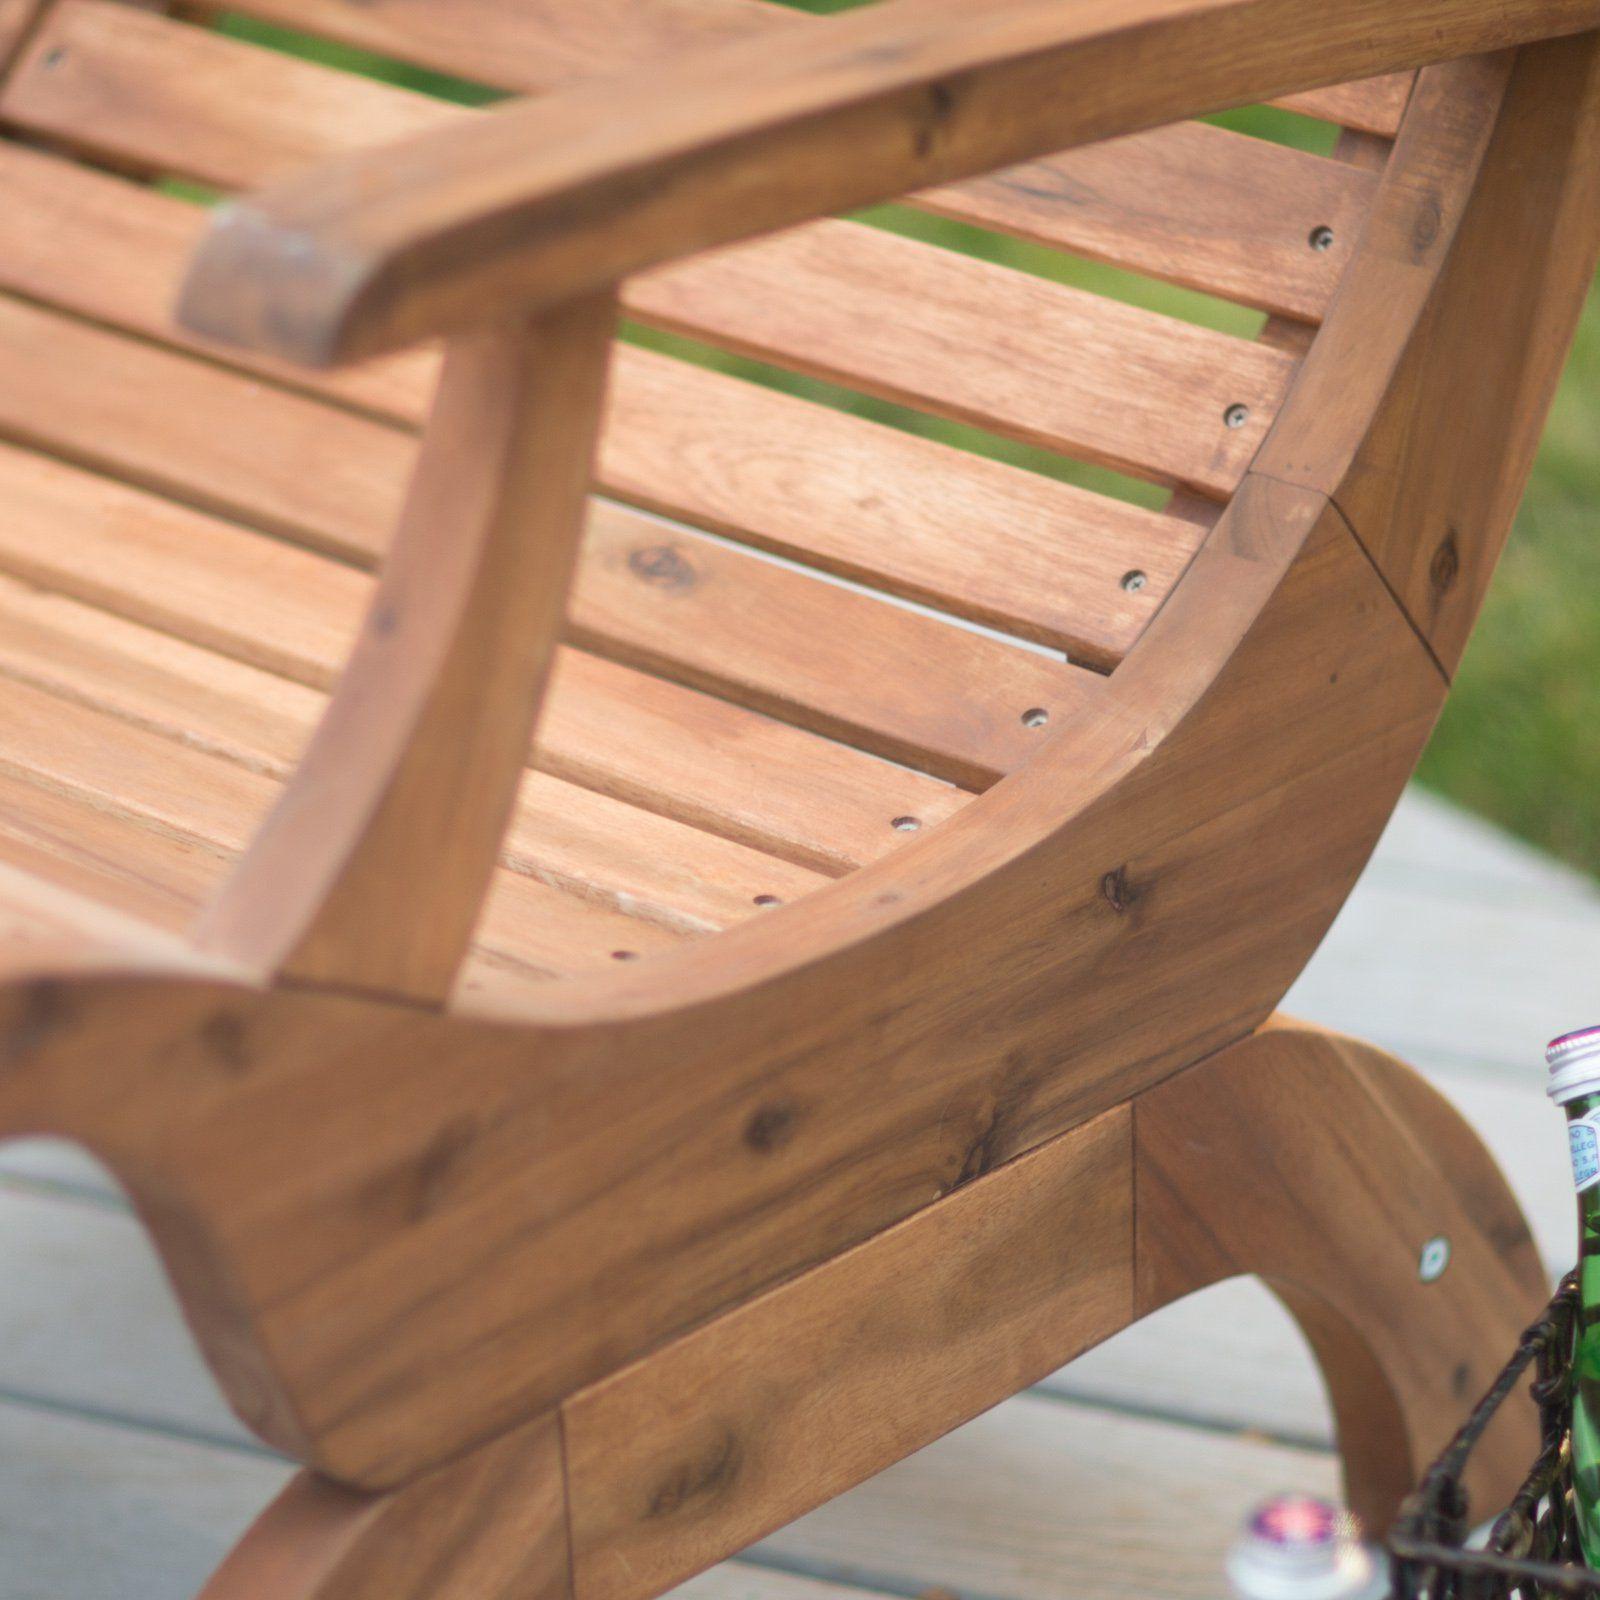 Belham living avondale adirondack chair natural